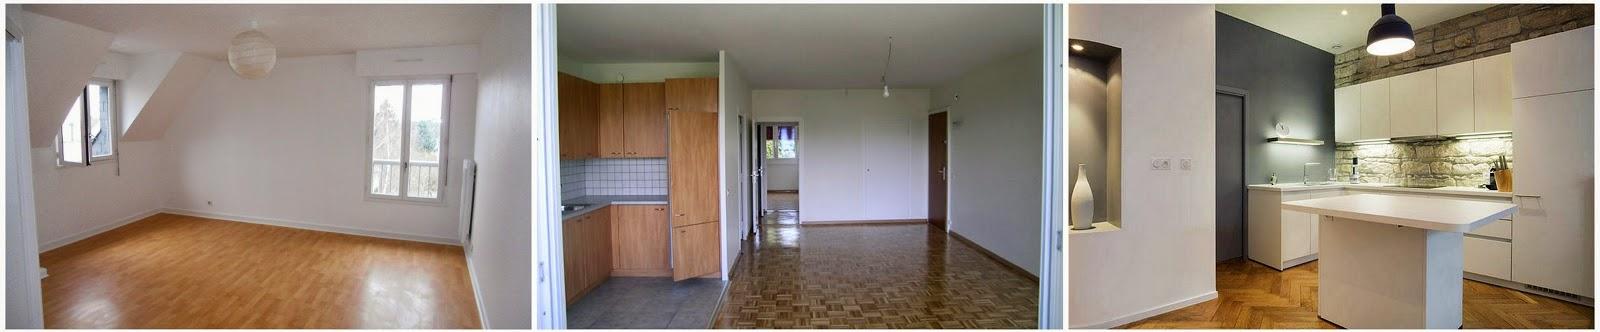 devis peinture appartement l 39 artisan peintre lehmanerenove. Black Bedroom Furniture Sets. Home Design Ideas